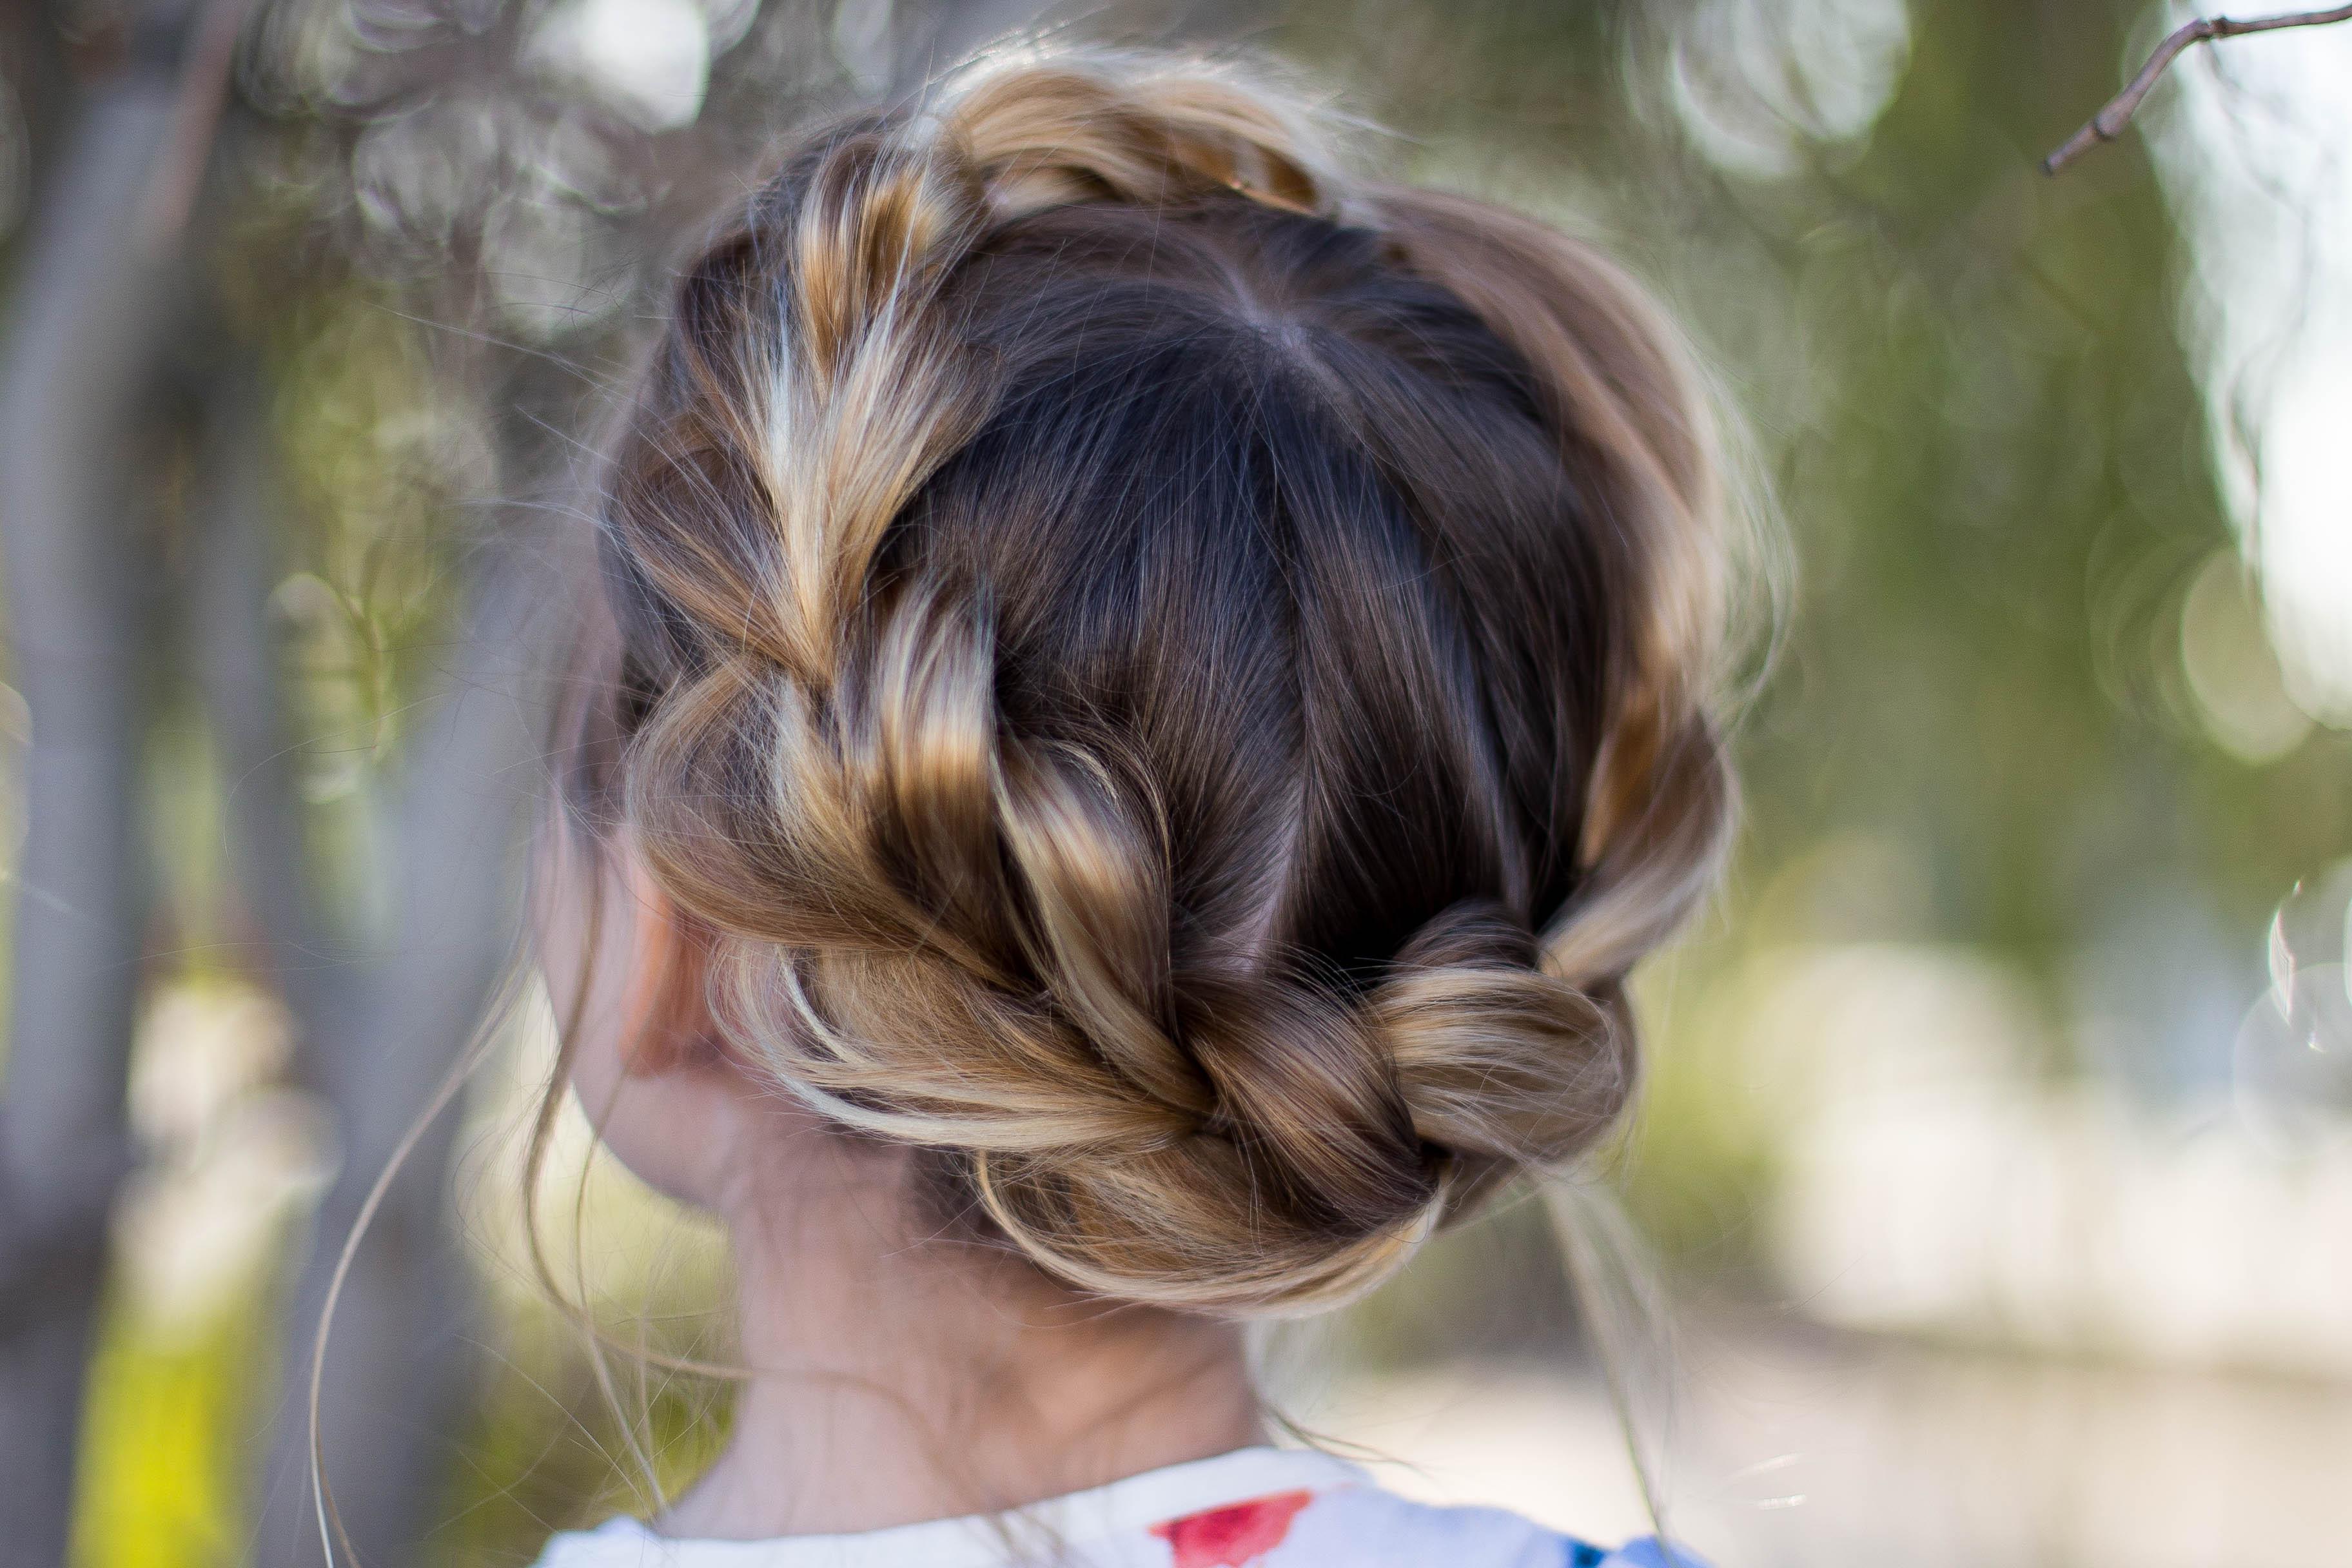 Boho Side Braids | Cute Girls Hairstyles |Pretty Braids For Girls